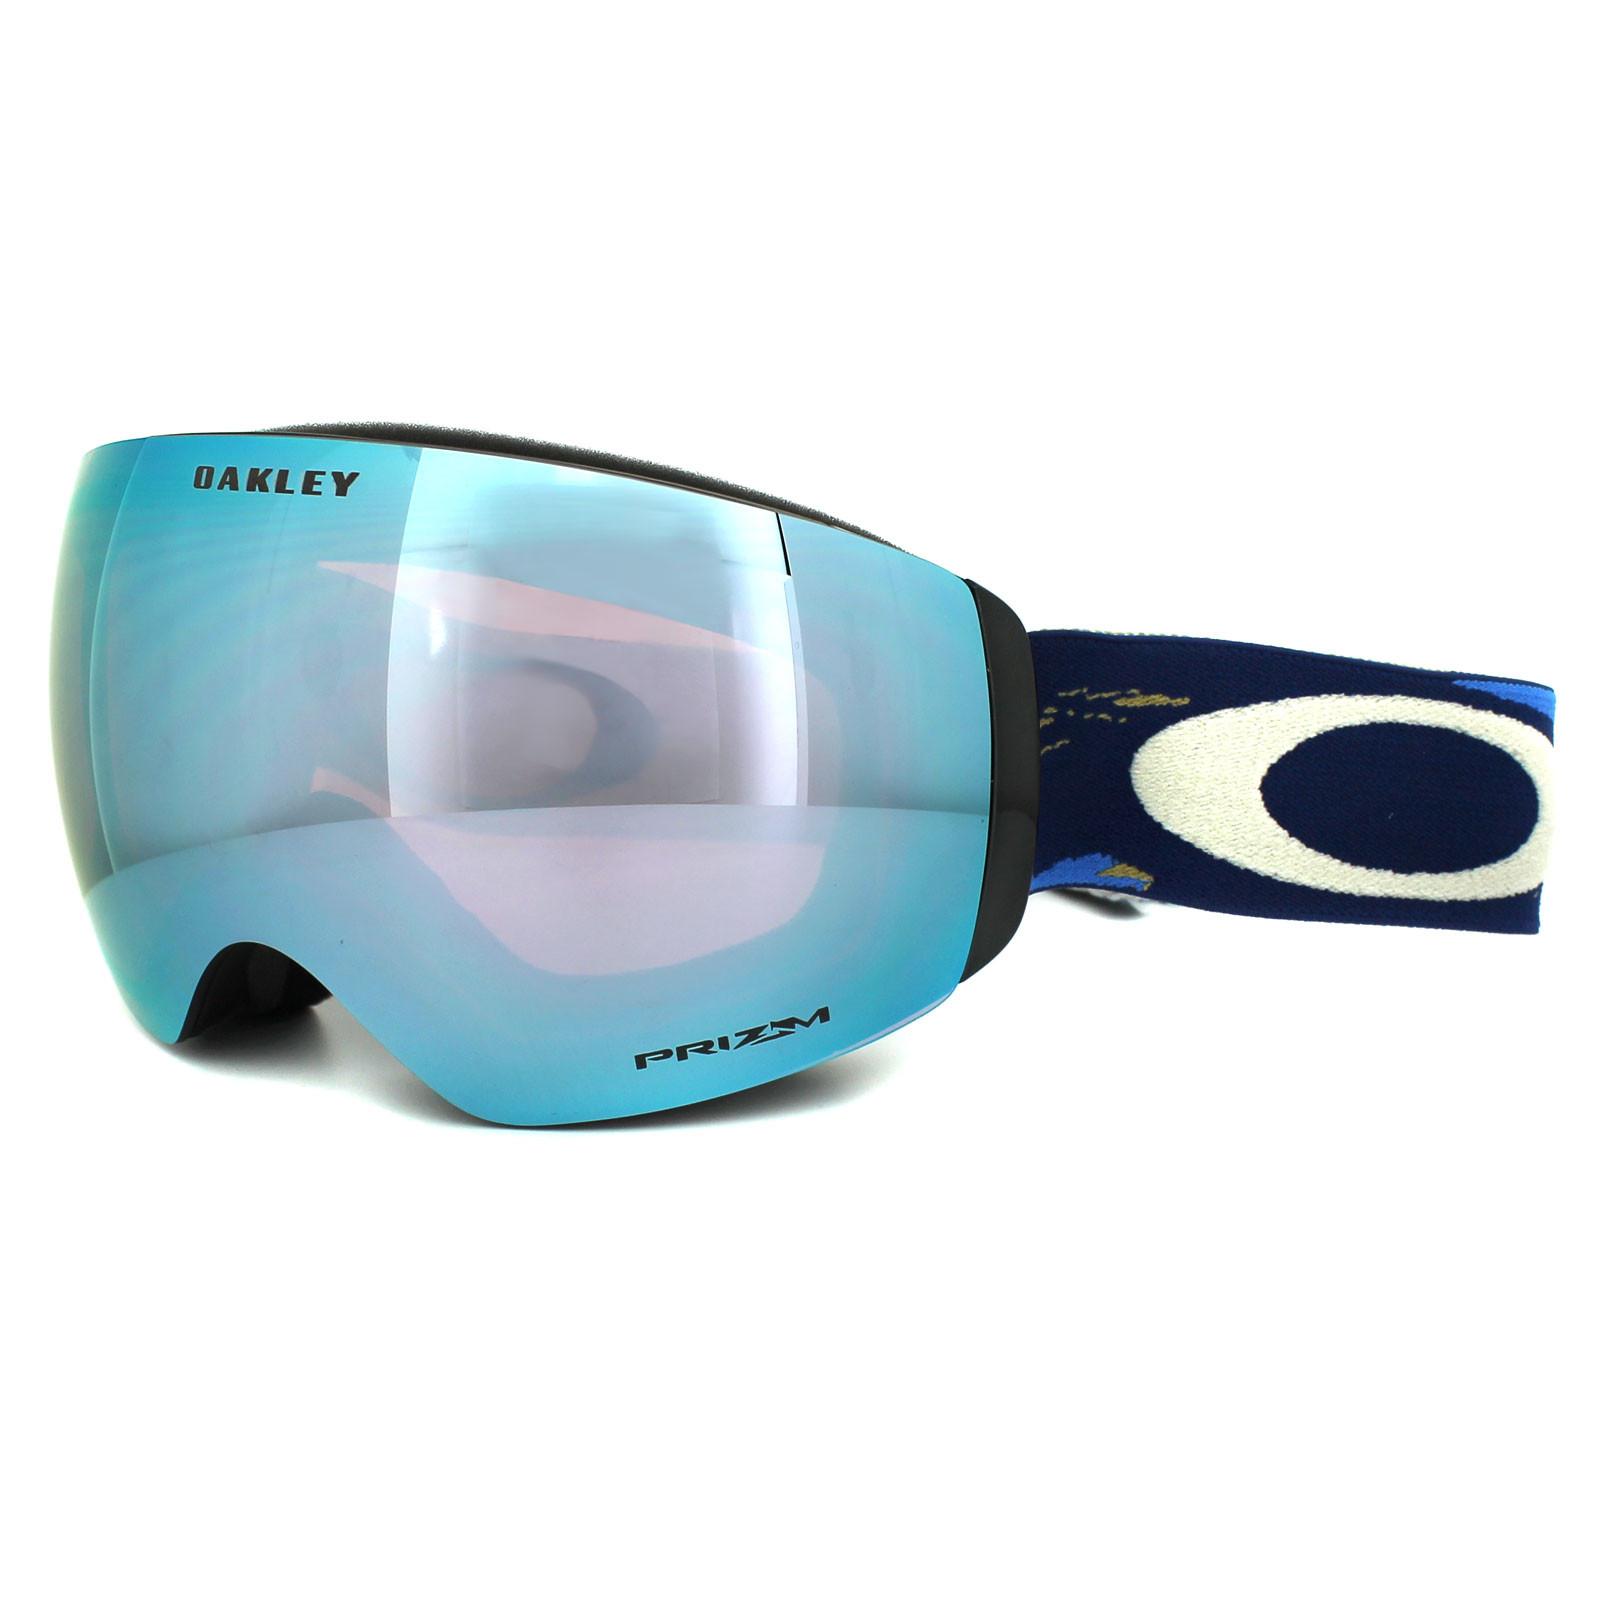 Oakley Flight Deck  Cheap Oakley Flight Deck XM Ski Goggles Discounted